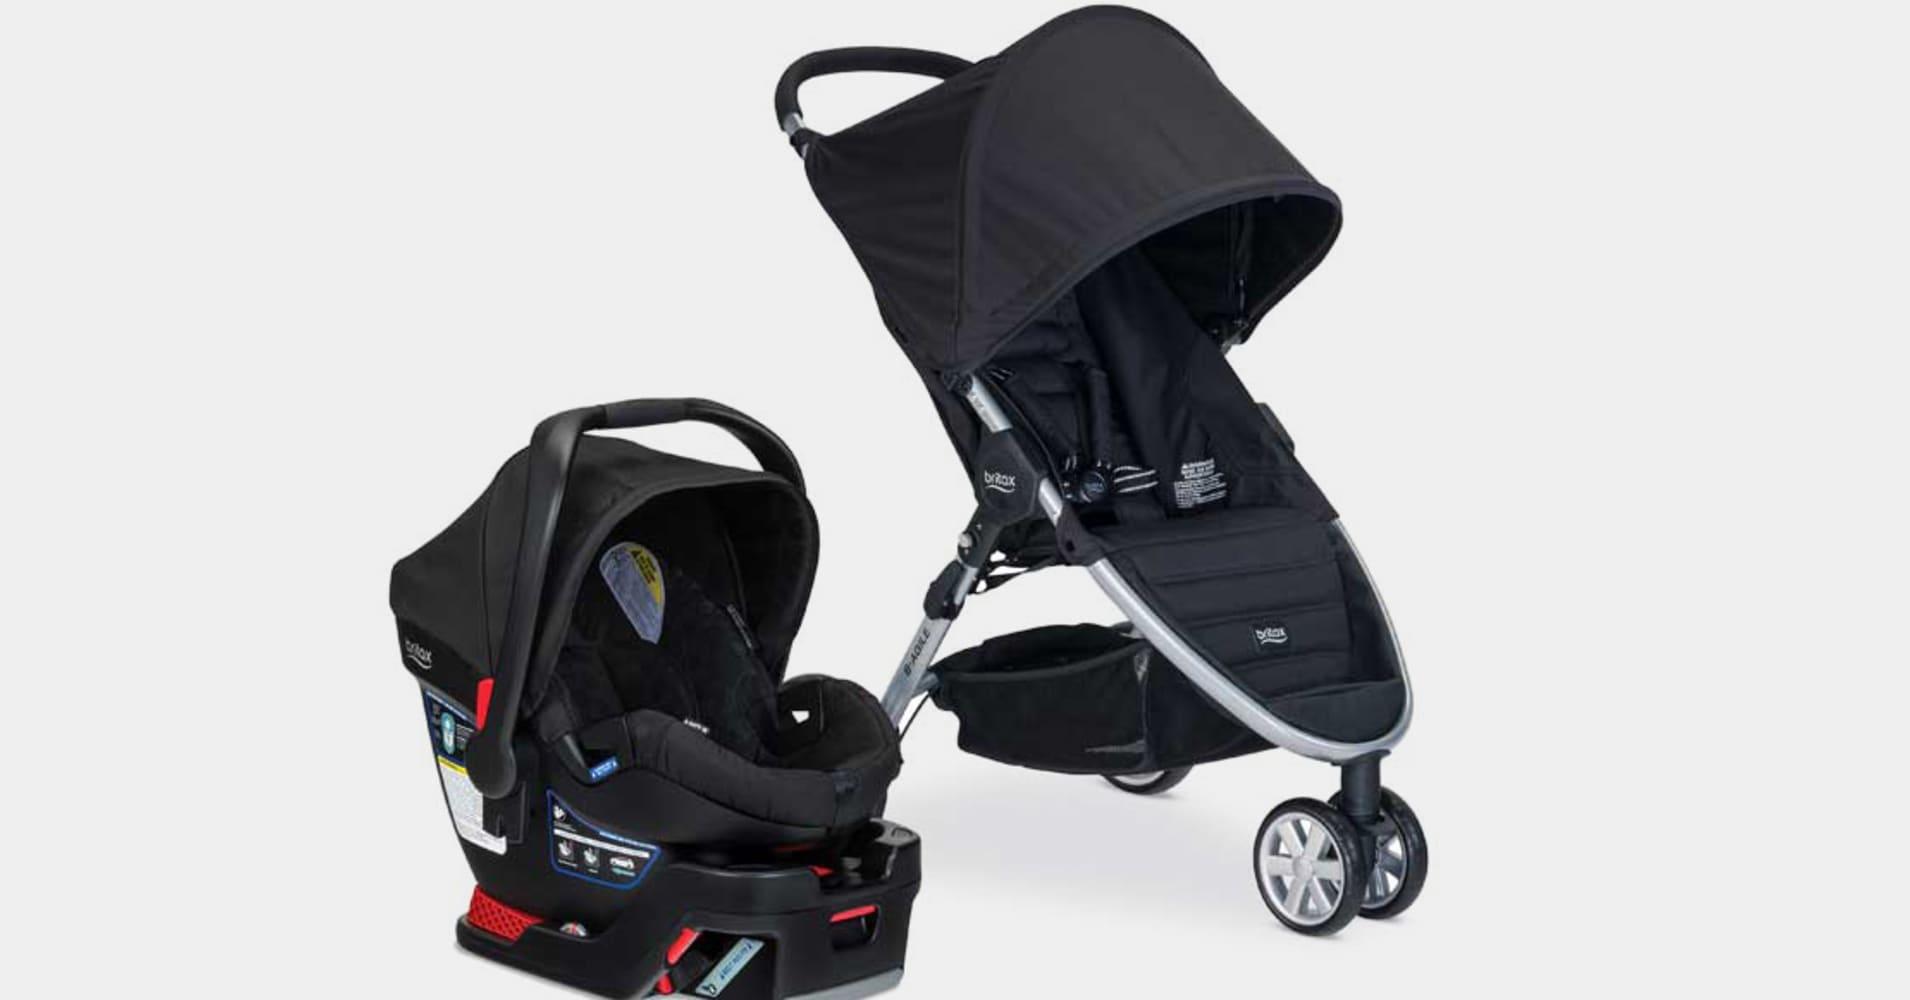 Britax Recalls Over 207k Infant Seats Due To Choking Hazard